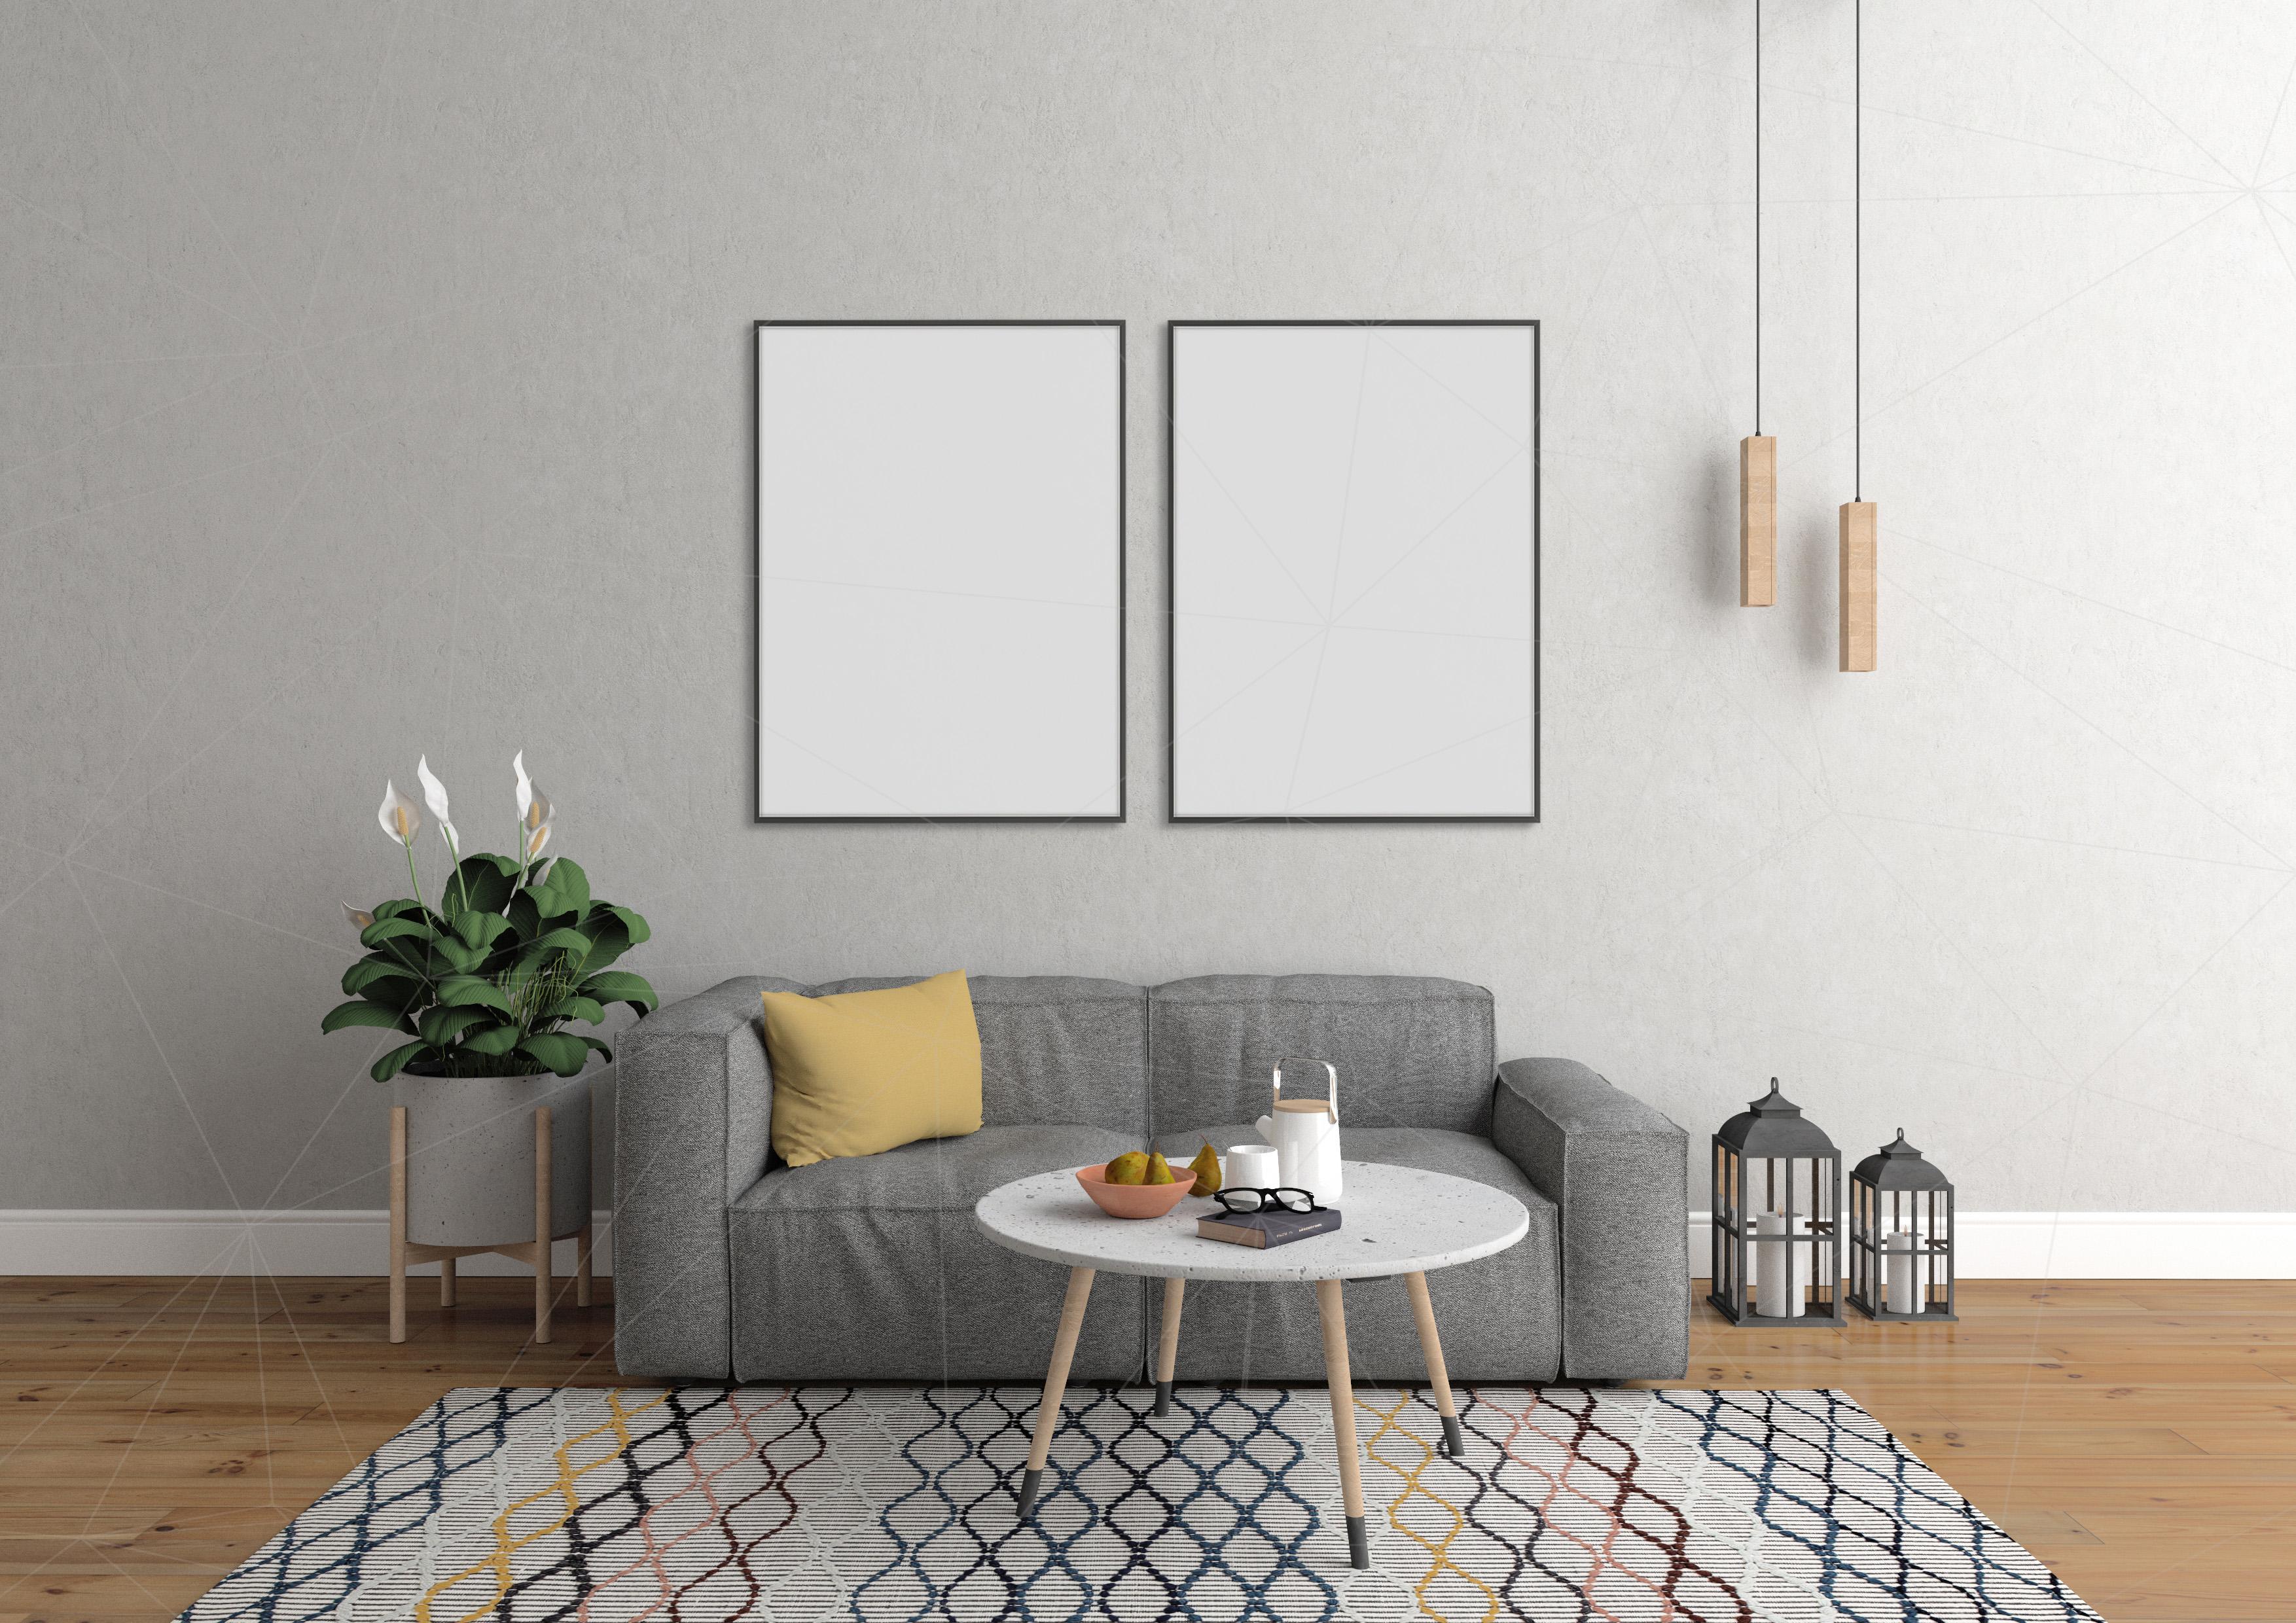 Interior mockup bundle - blank wall mock up example image 4